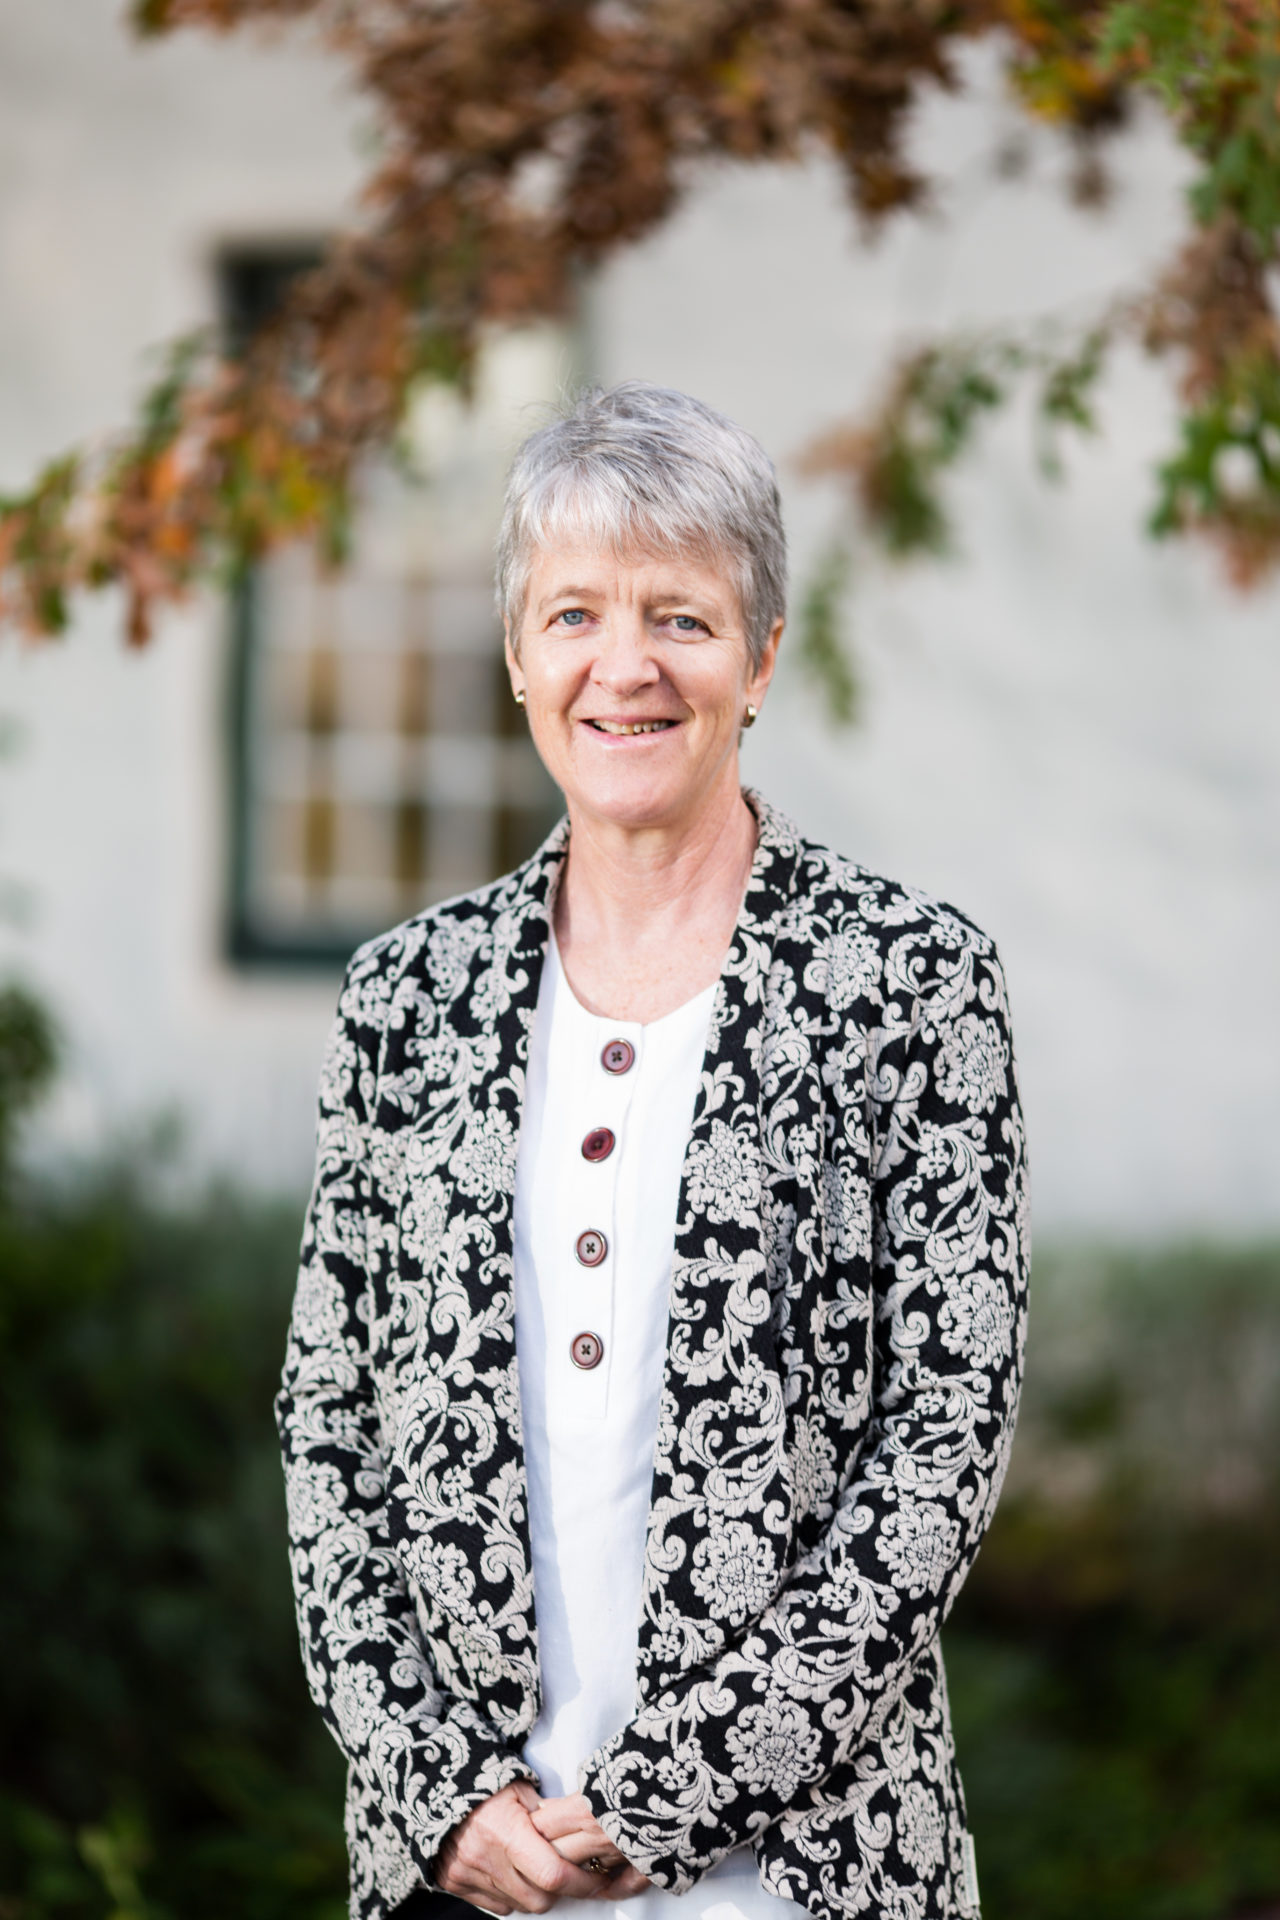 Janet Welham